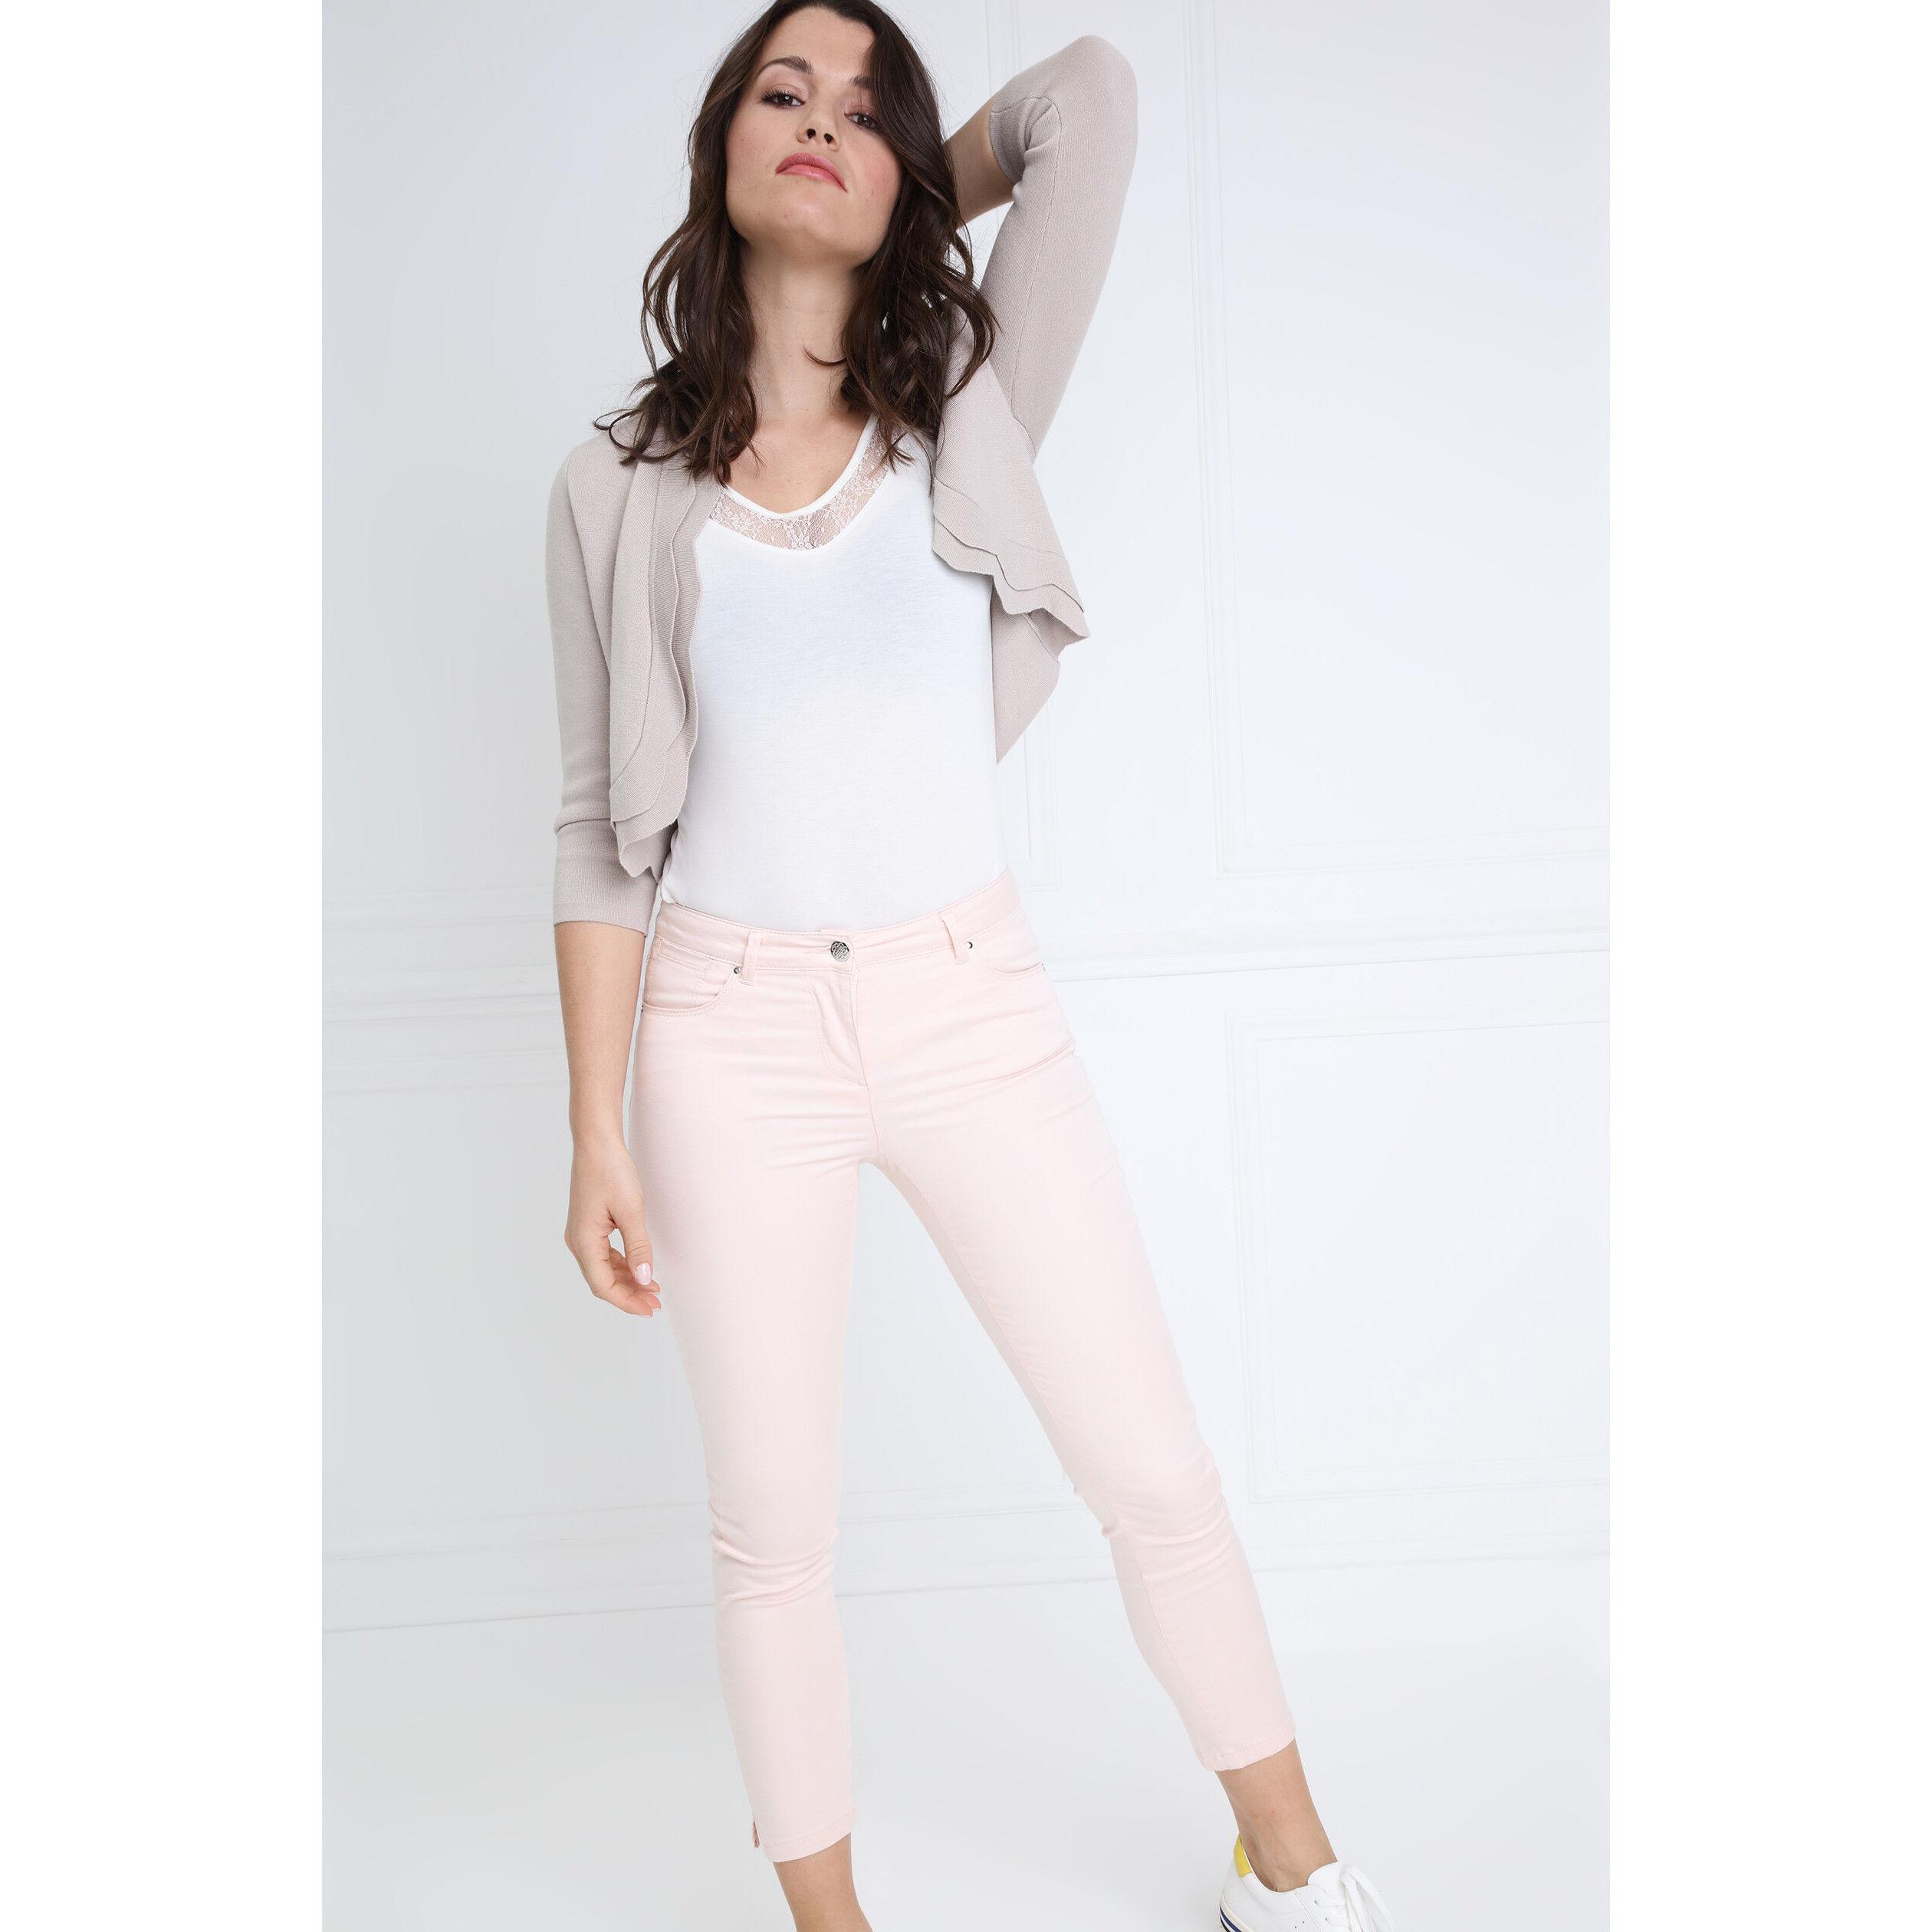 Basculée FemmeBréal Rose Clair 78 Pantalon Taille m80wNn